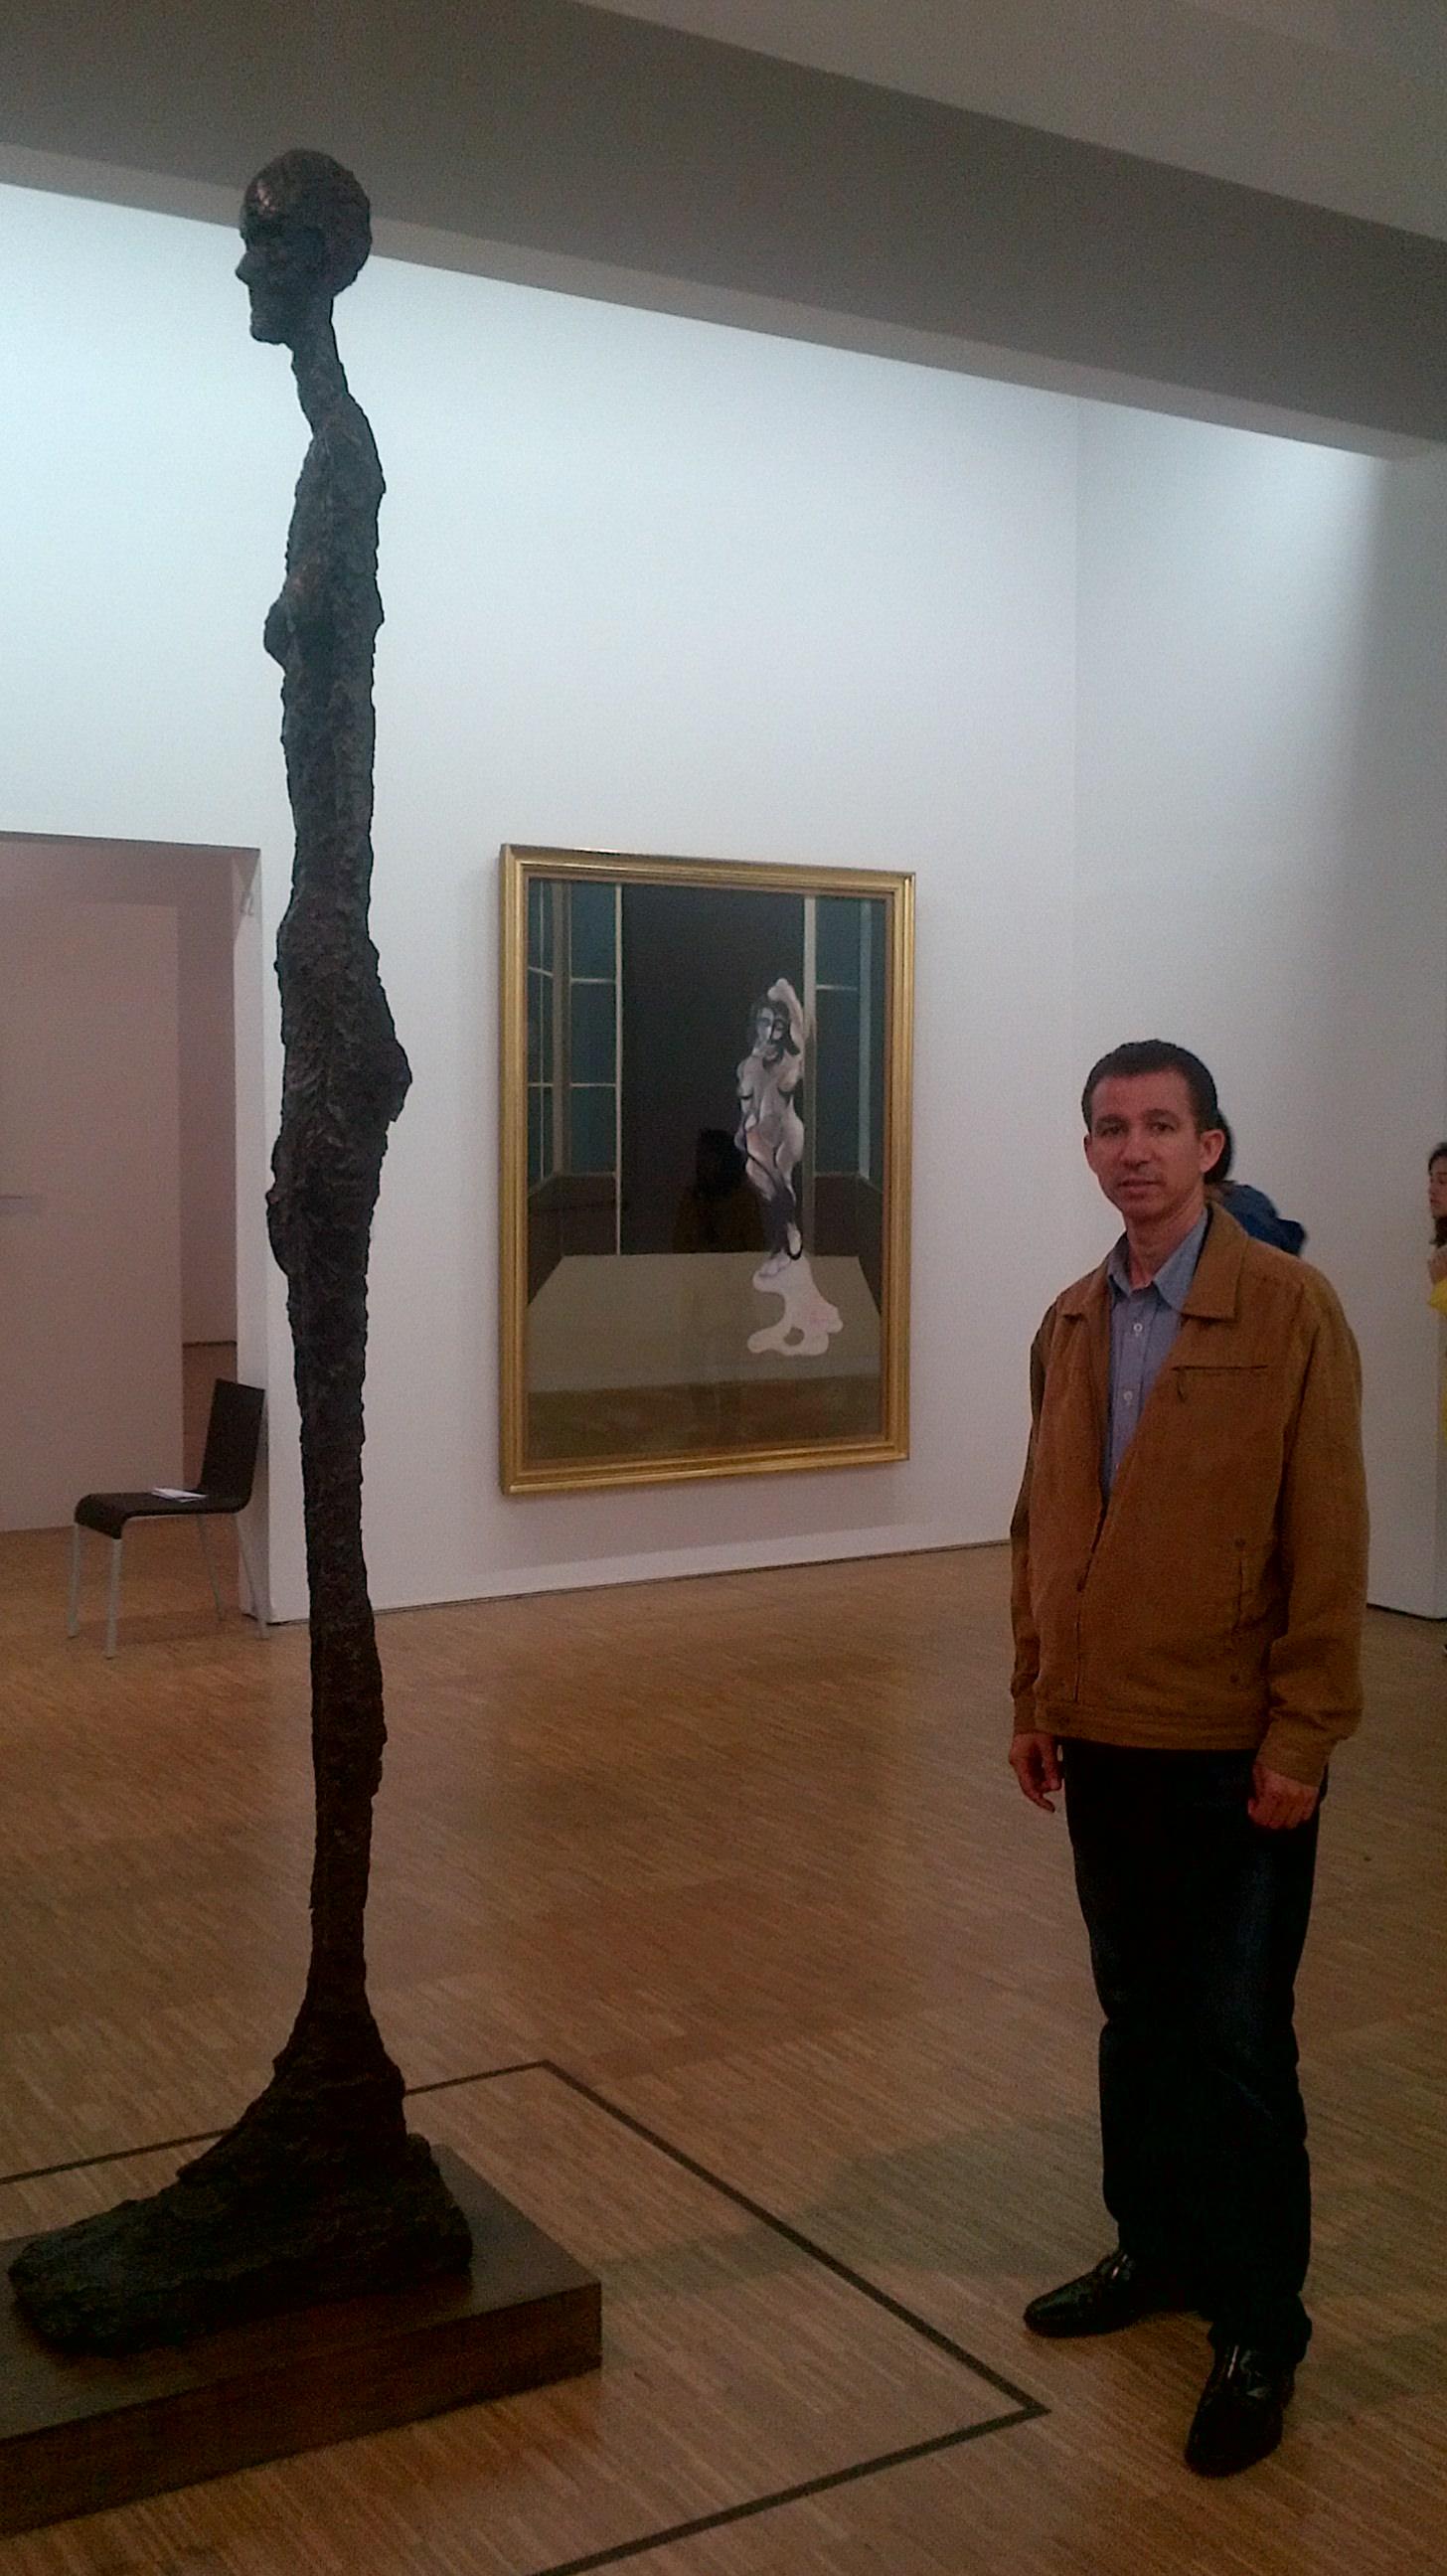 Ante la Obra de Giacometti, París, Francia